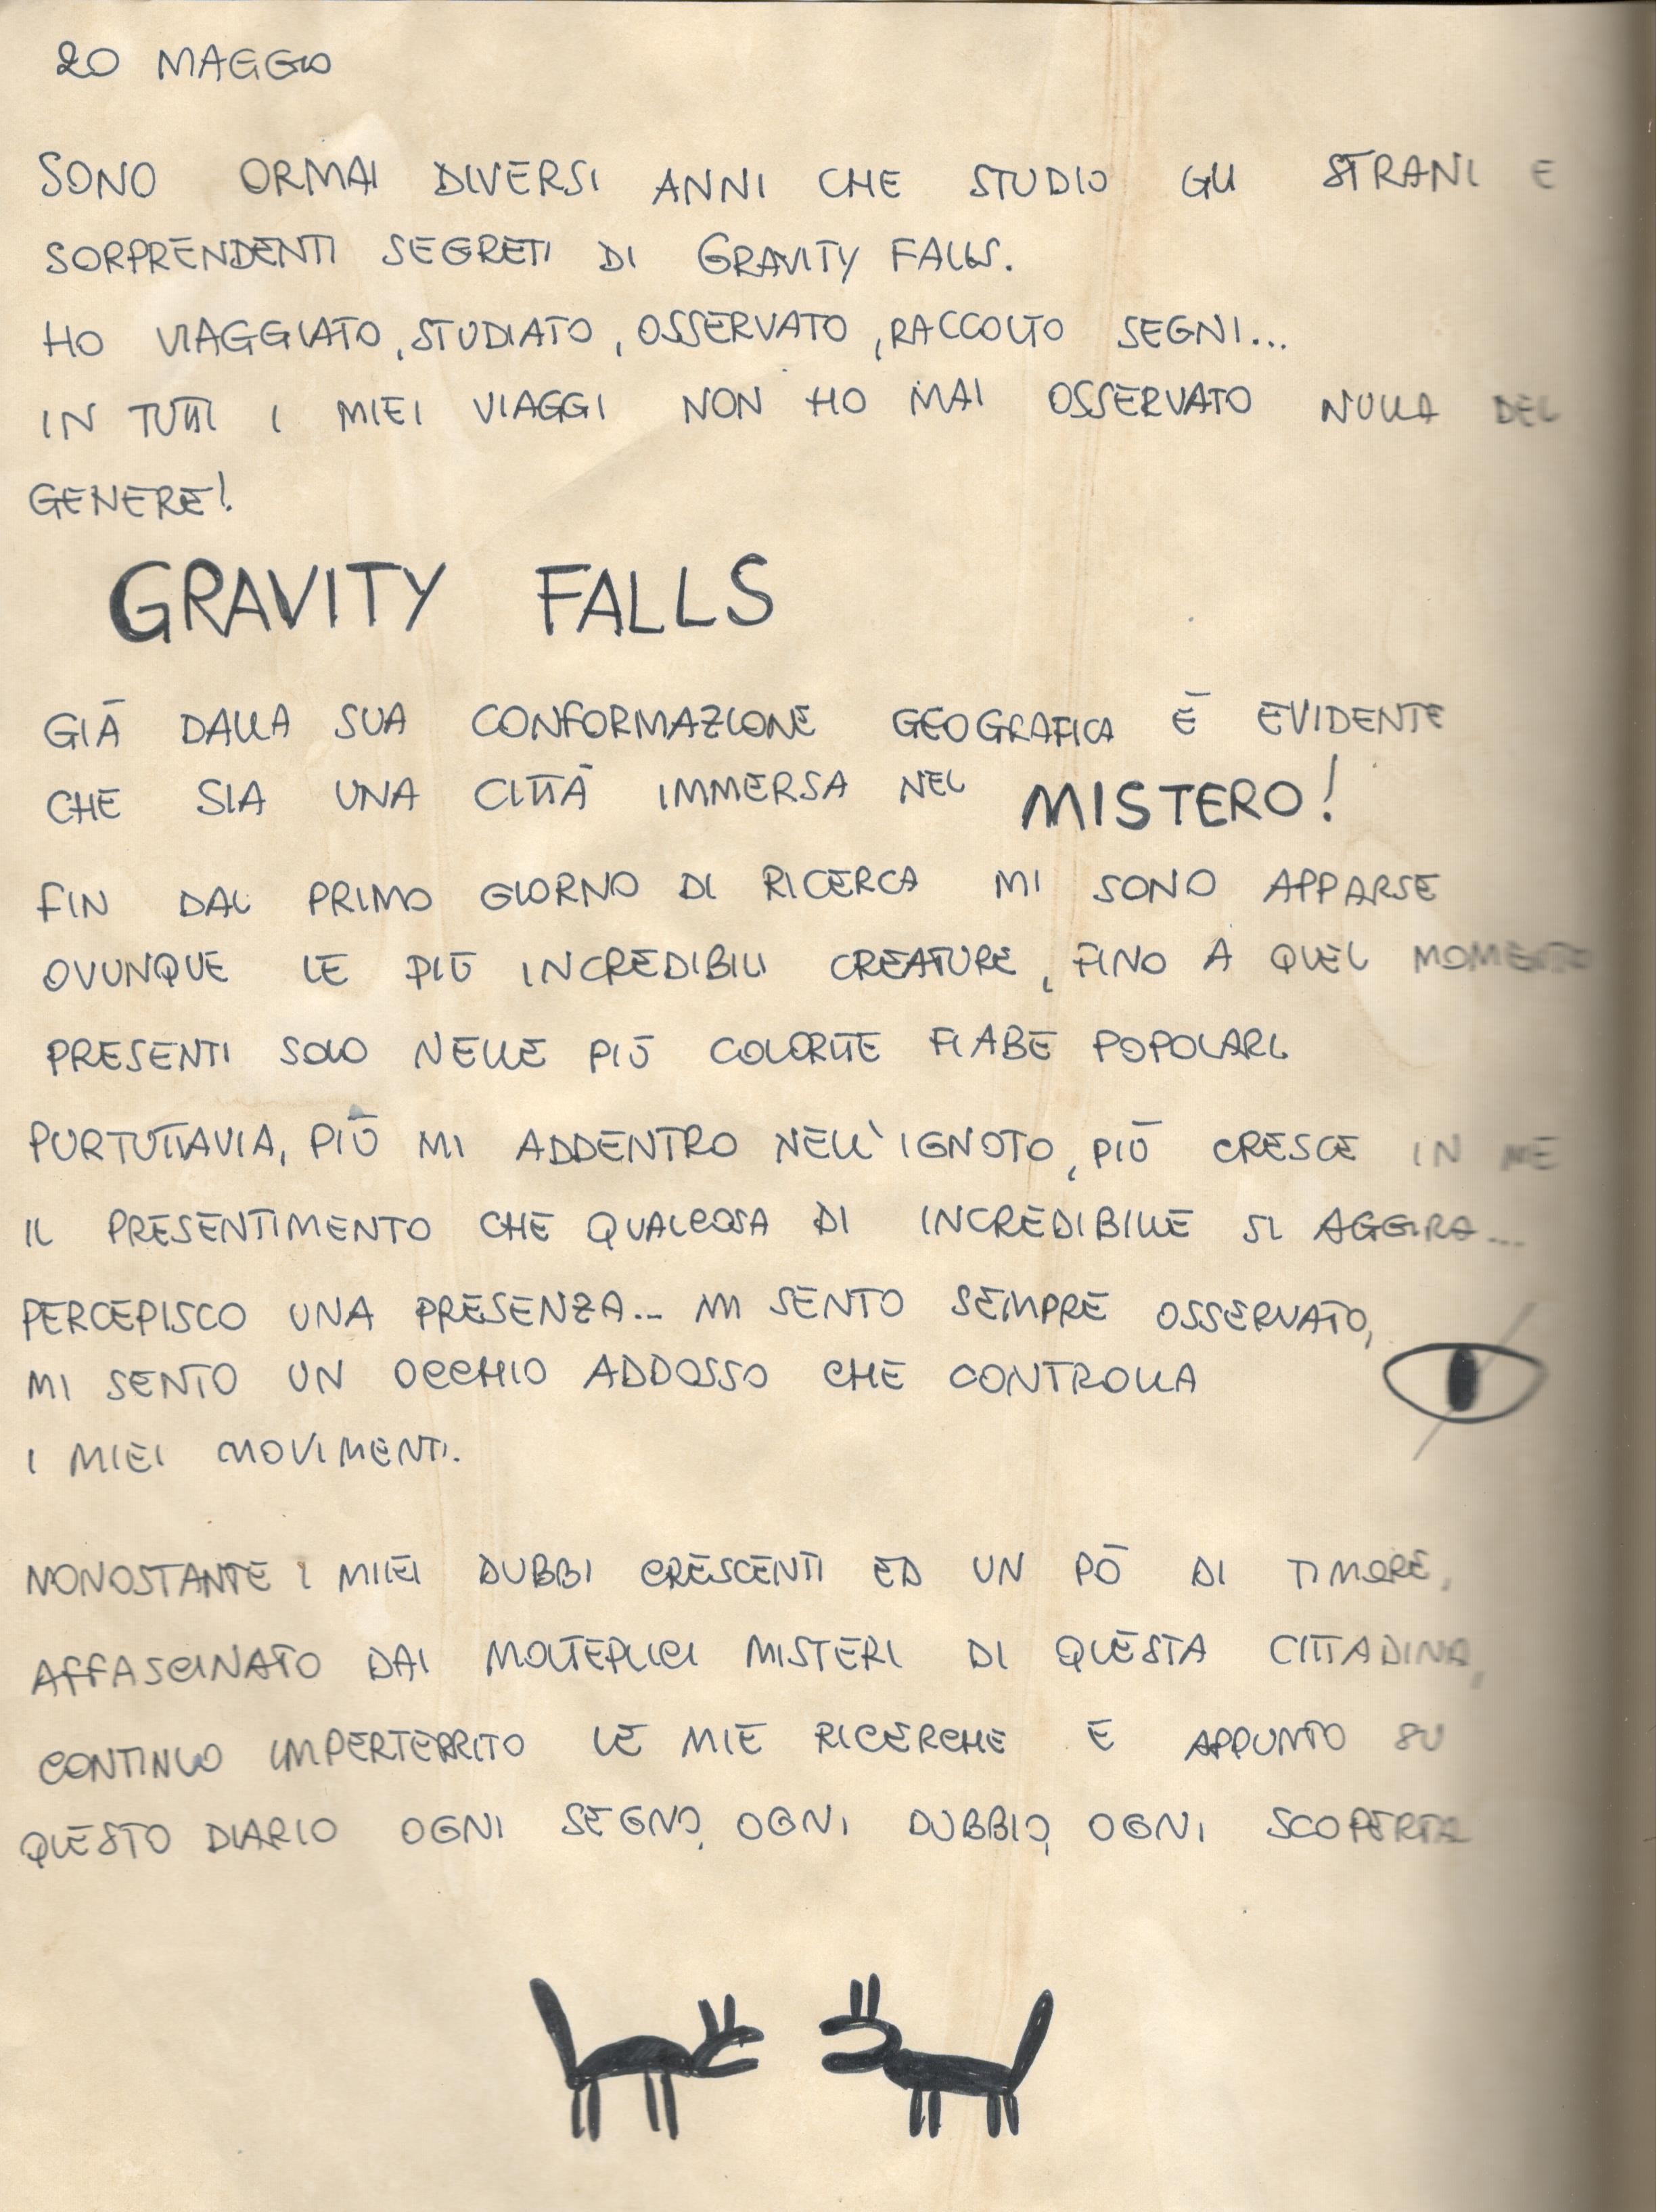 Diario_03_Gravity_Falls_Meschia_2019_-6